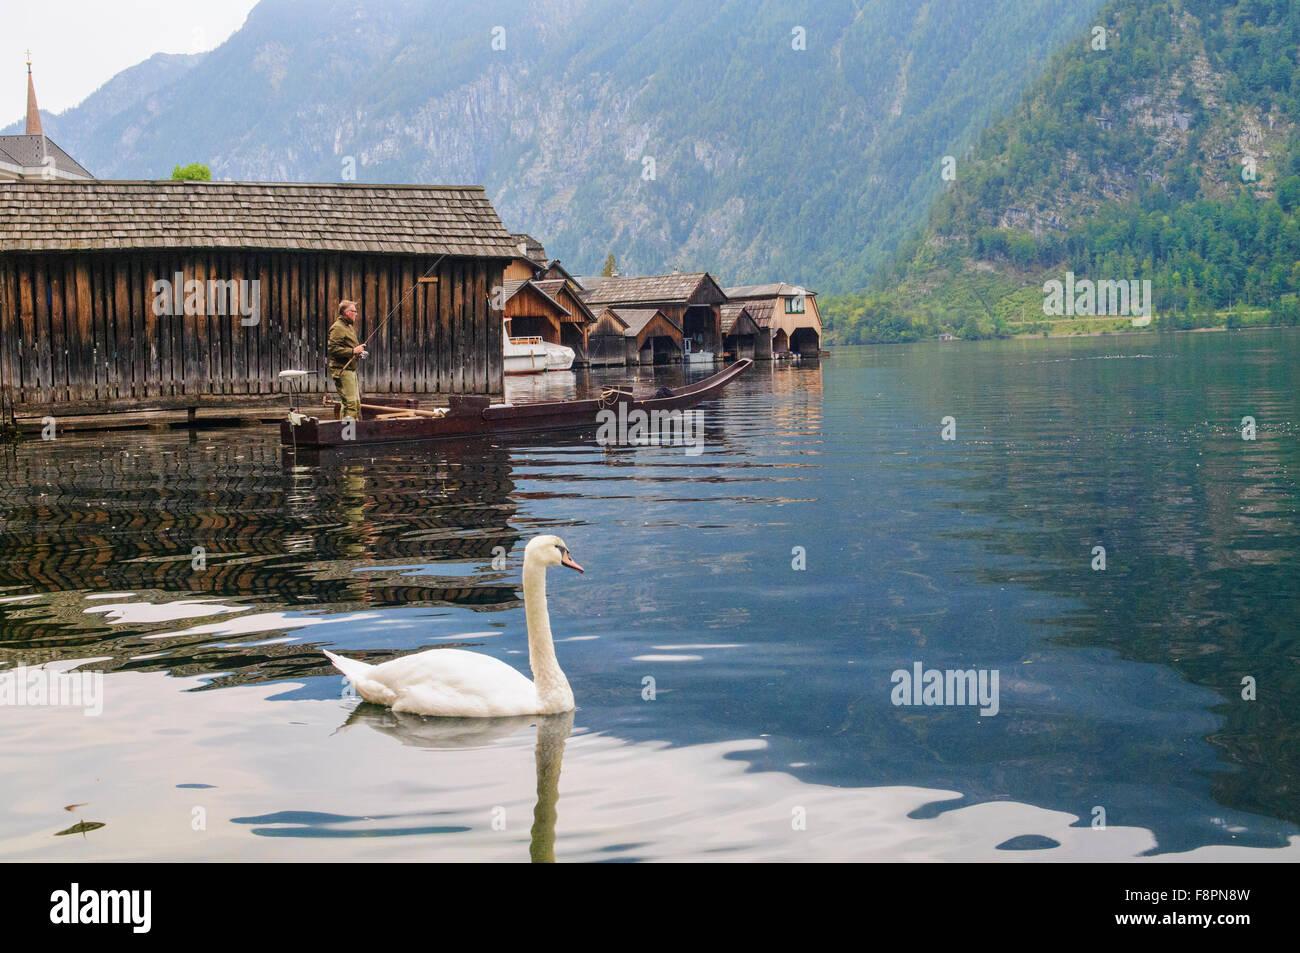 Beautiful white duck at Hallstatt Lake, Hallstatt, Salzkammergut, Austria - Stock Image